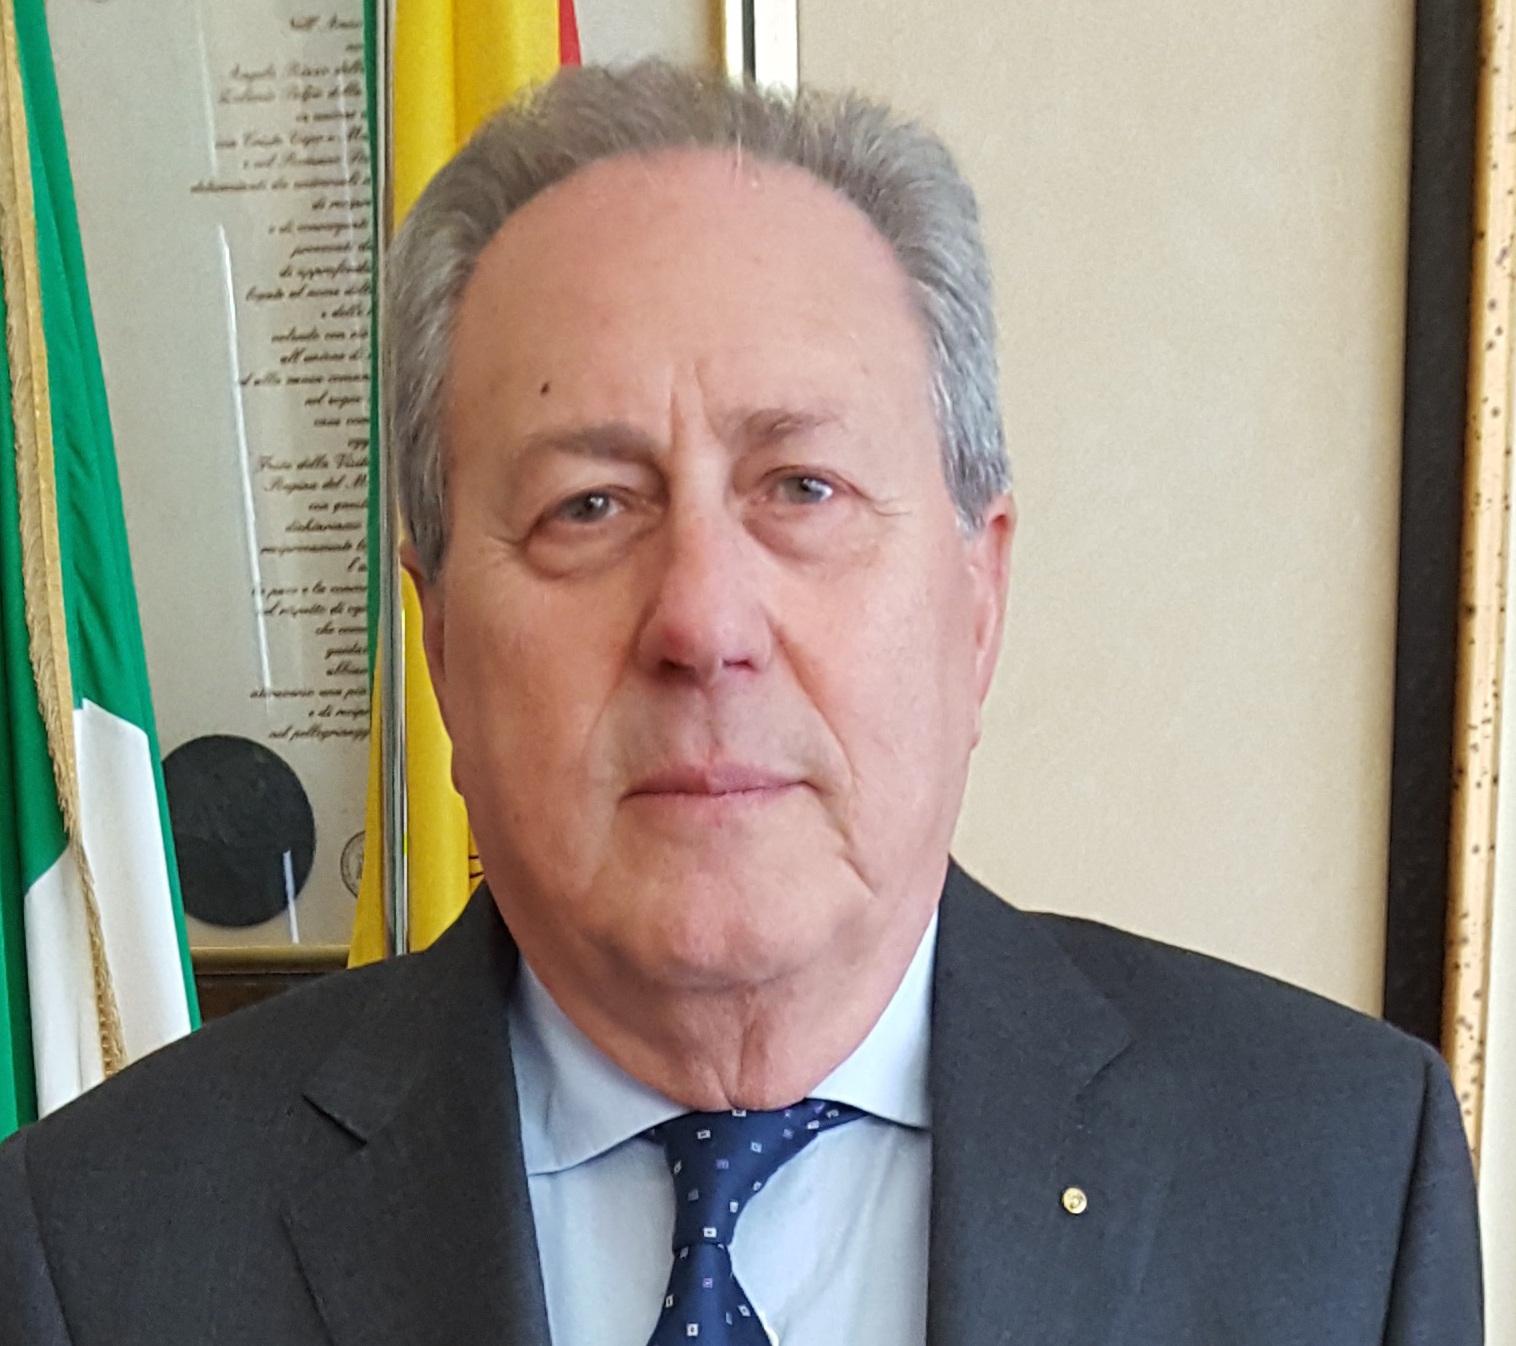 Rifiuti: Ragusa, il commissario straordinario incontra i sindaci